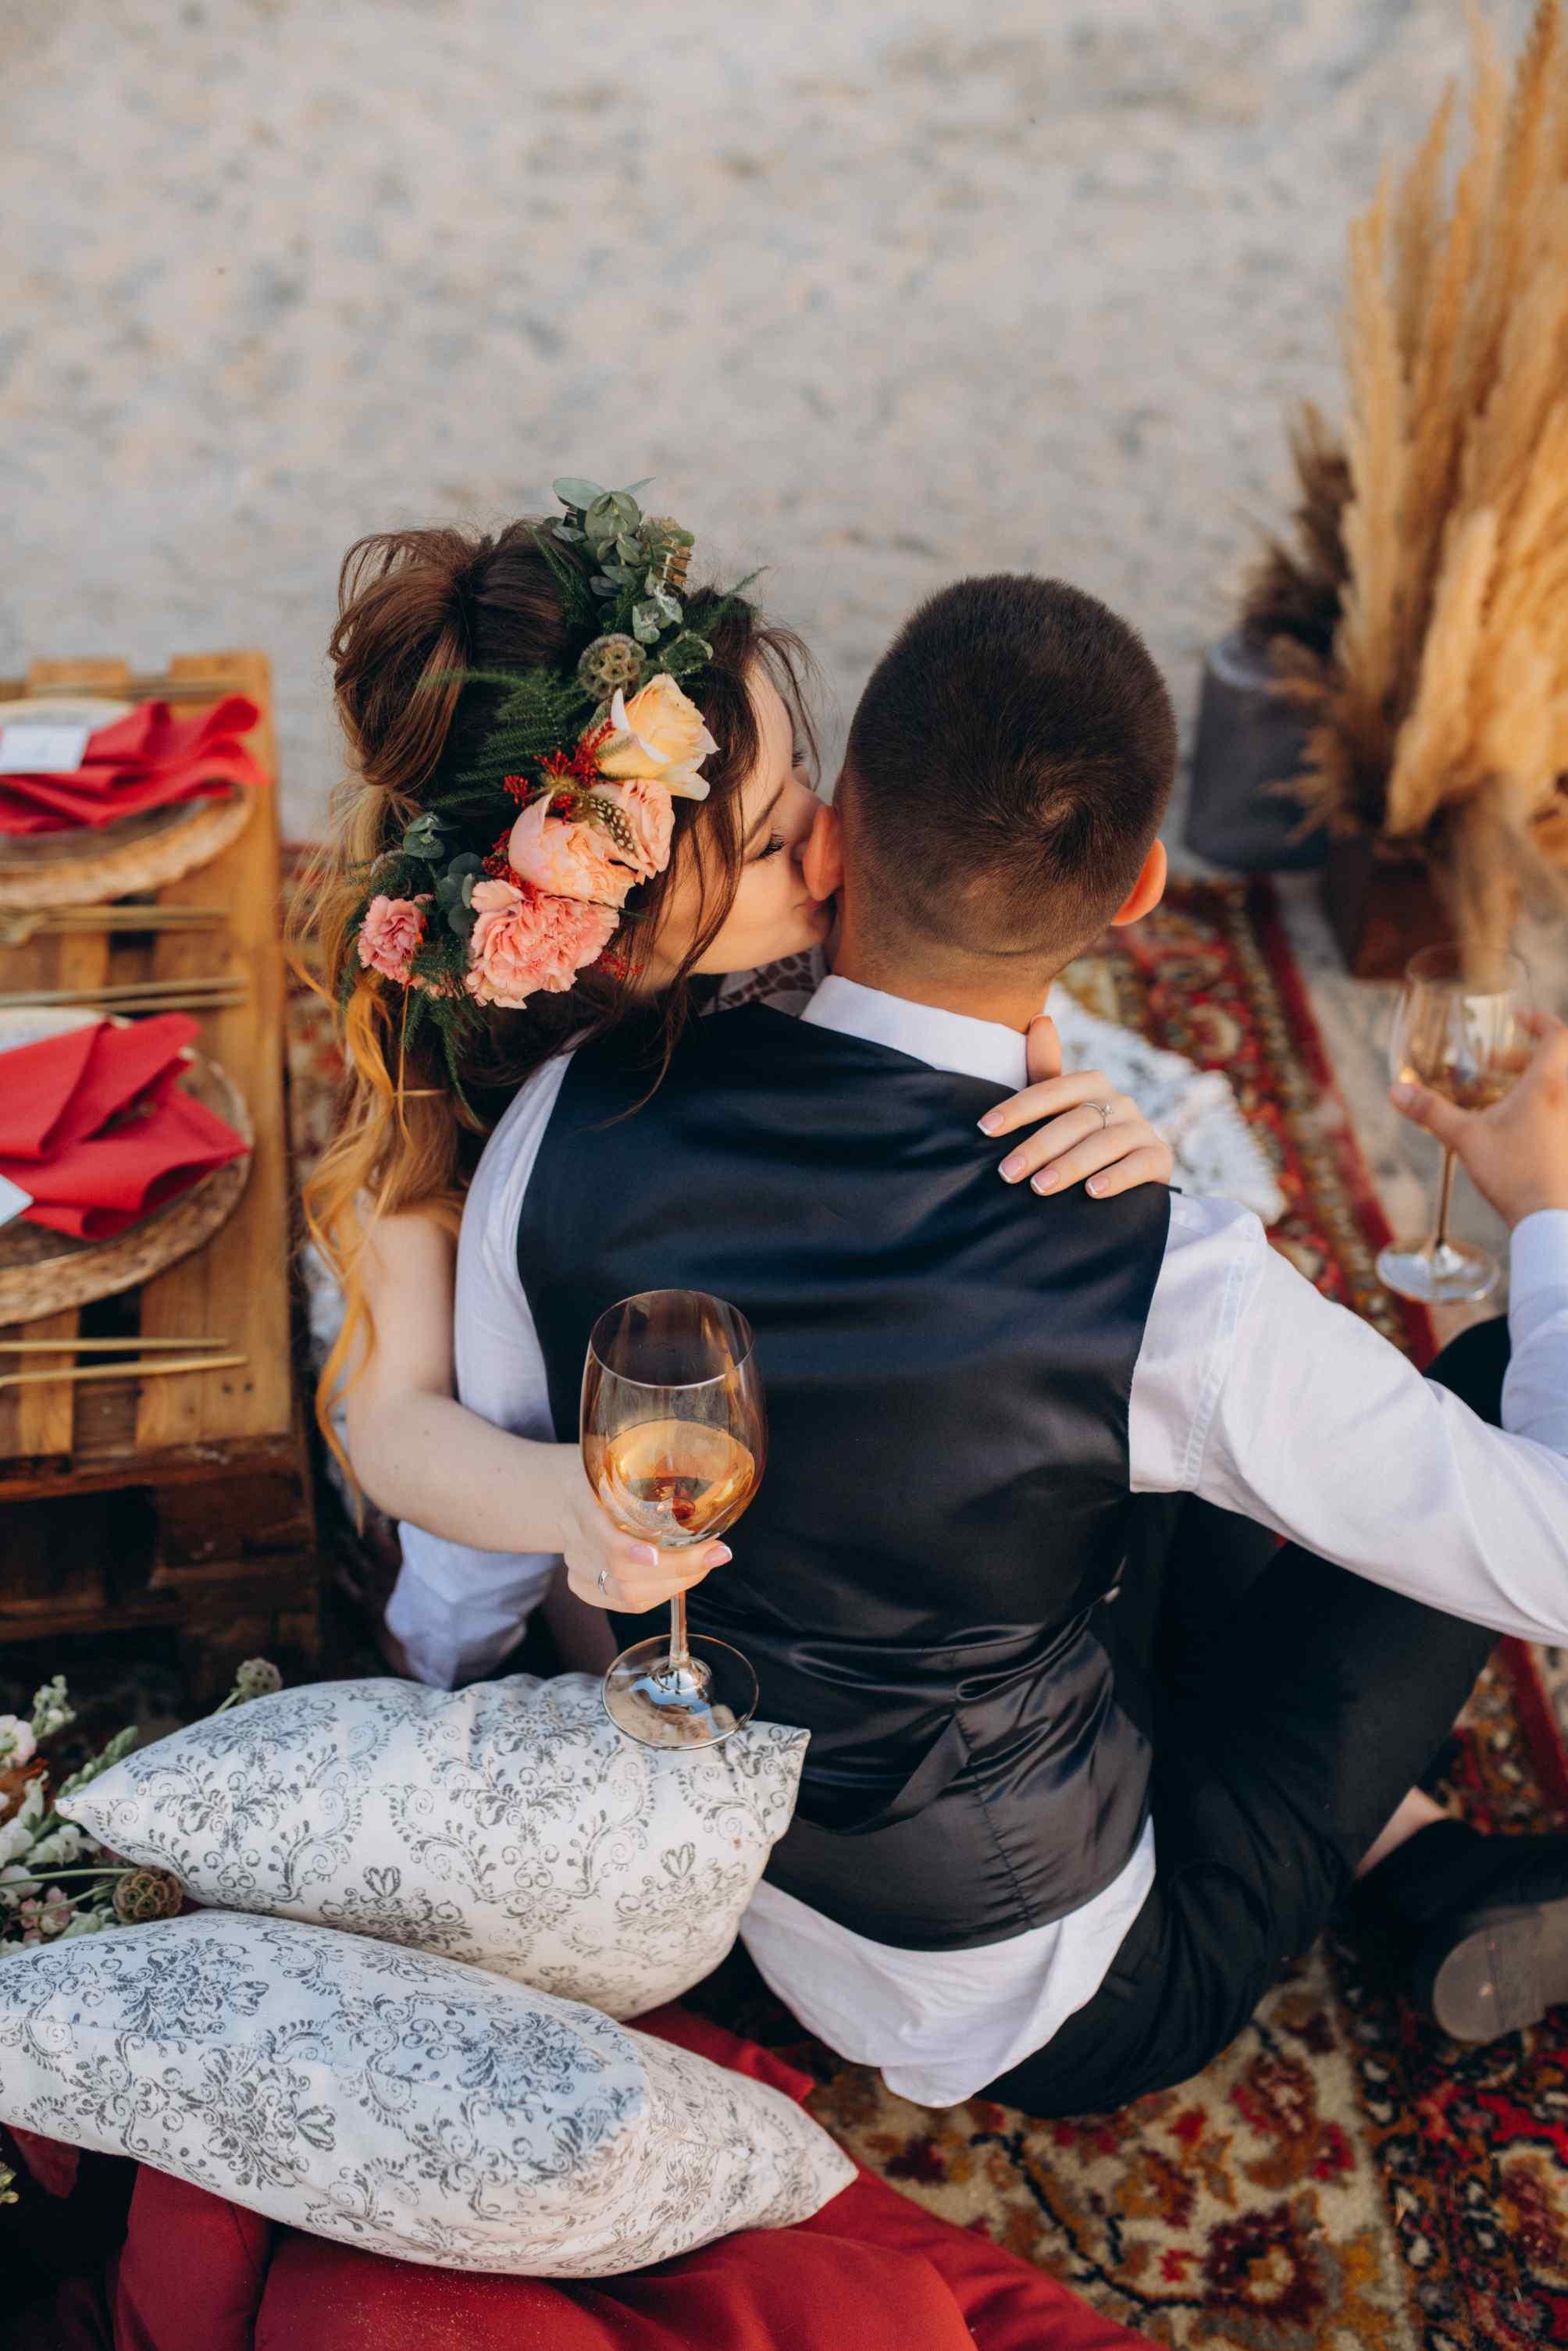 организация романтических свиданий